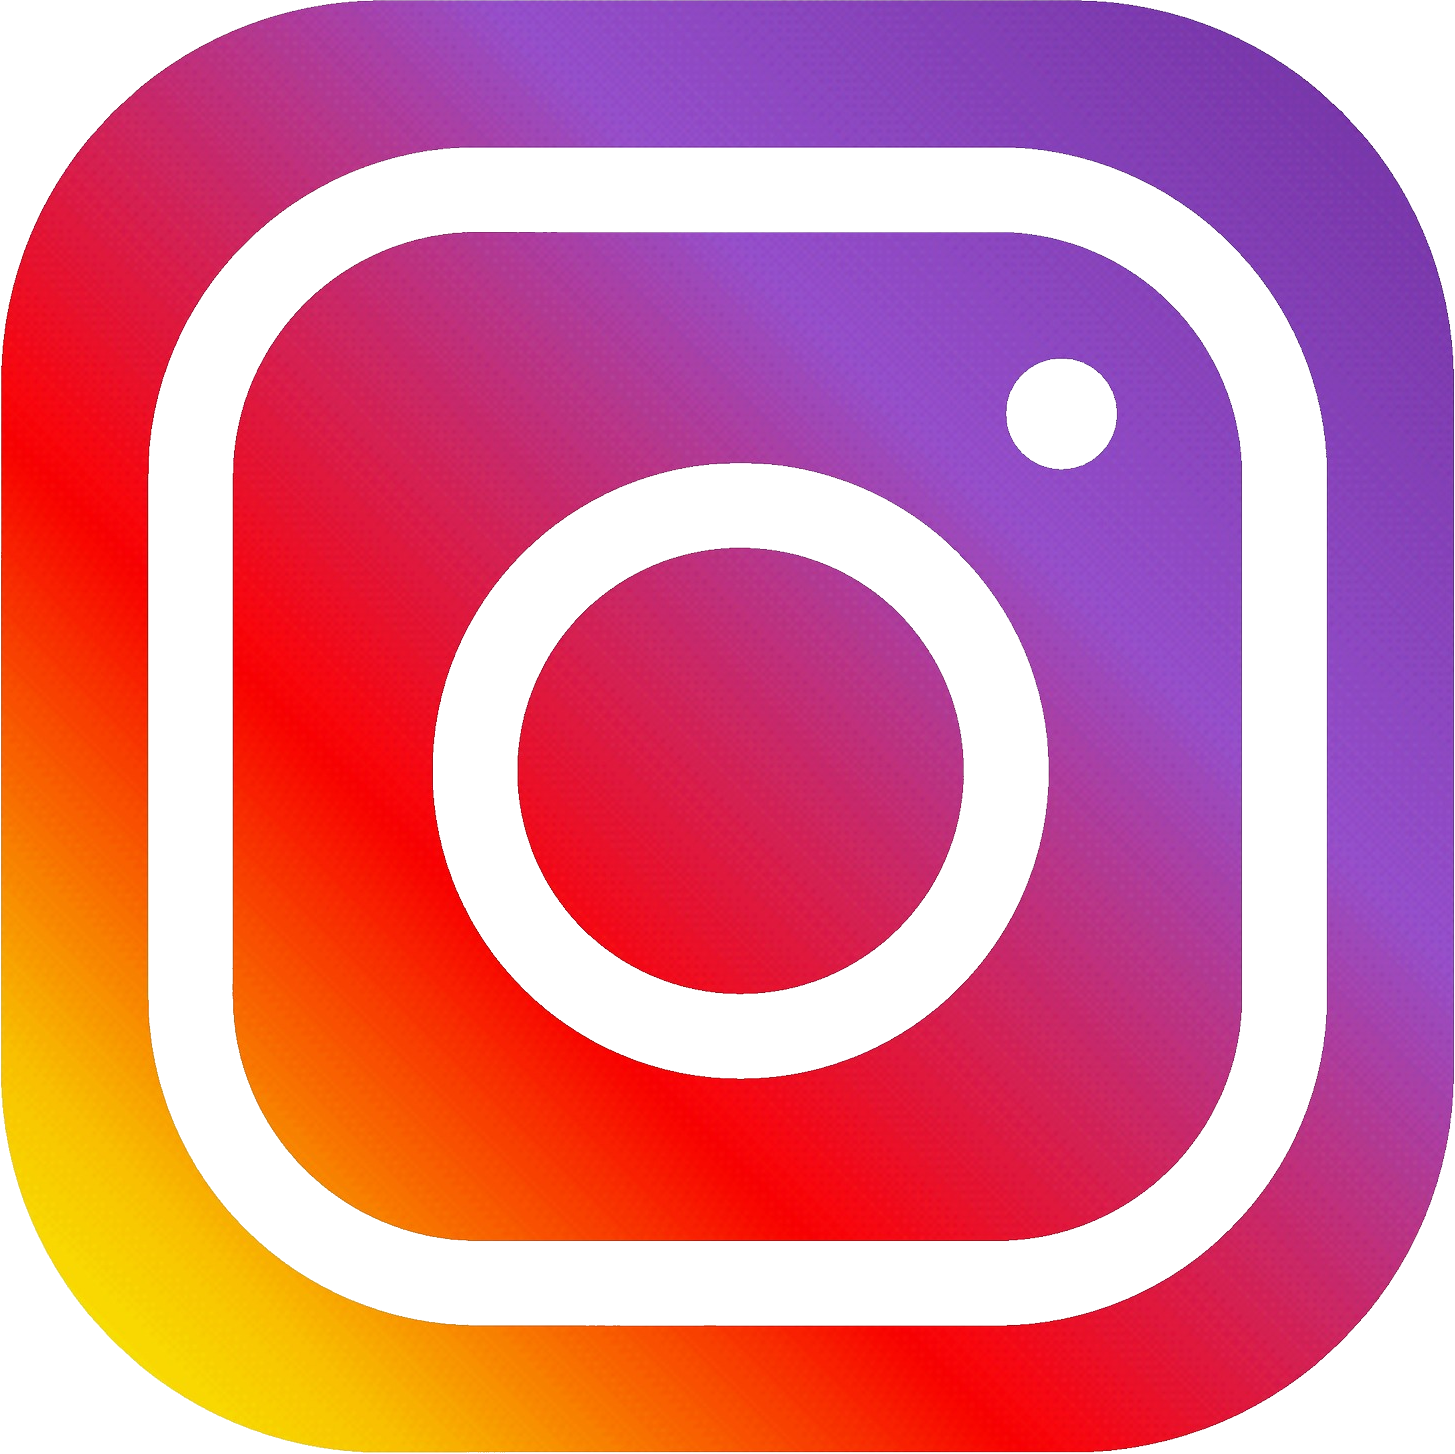 Circle clipart instagram, Circle instagram Transparent FREE.